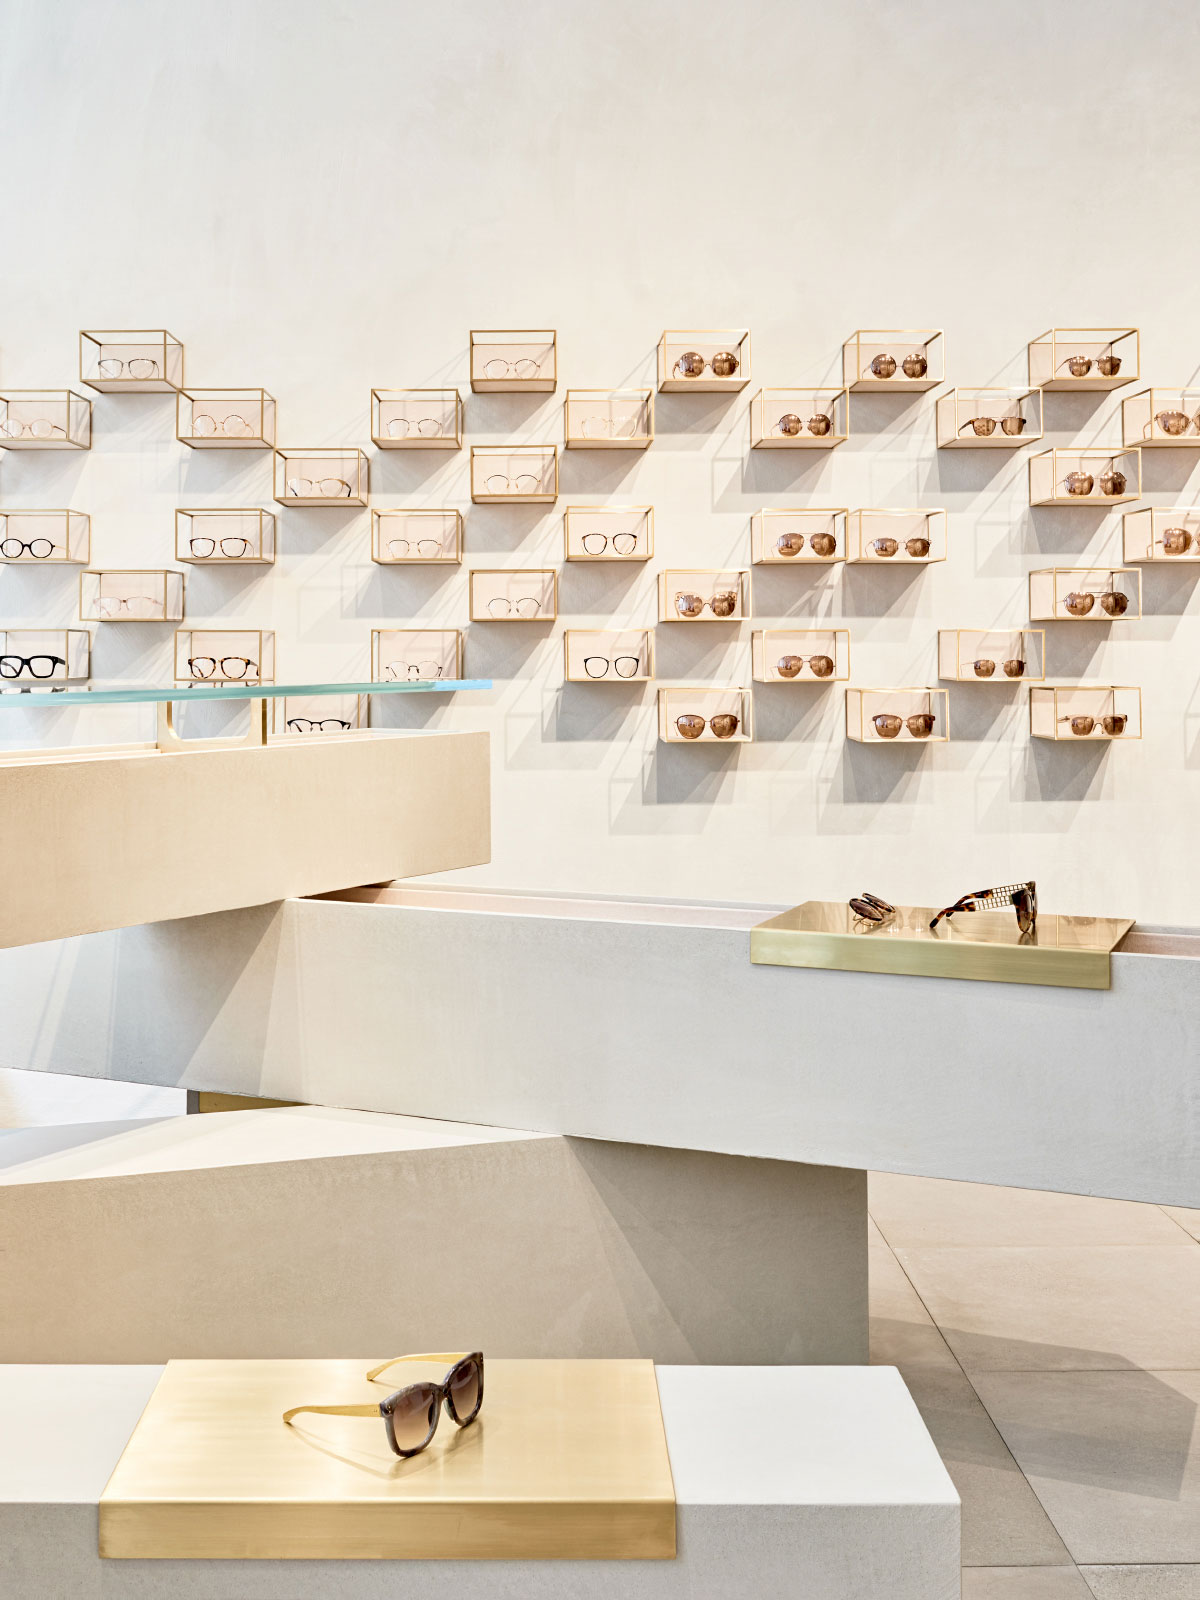 Studio Giancarlo Valle Designs Linda Farrow's First US Store in SoHo, New York City | Yellowtrace